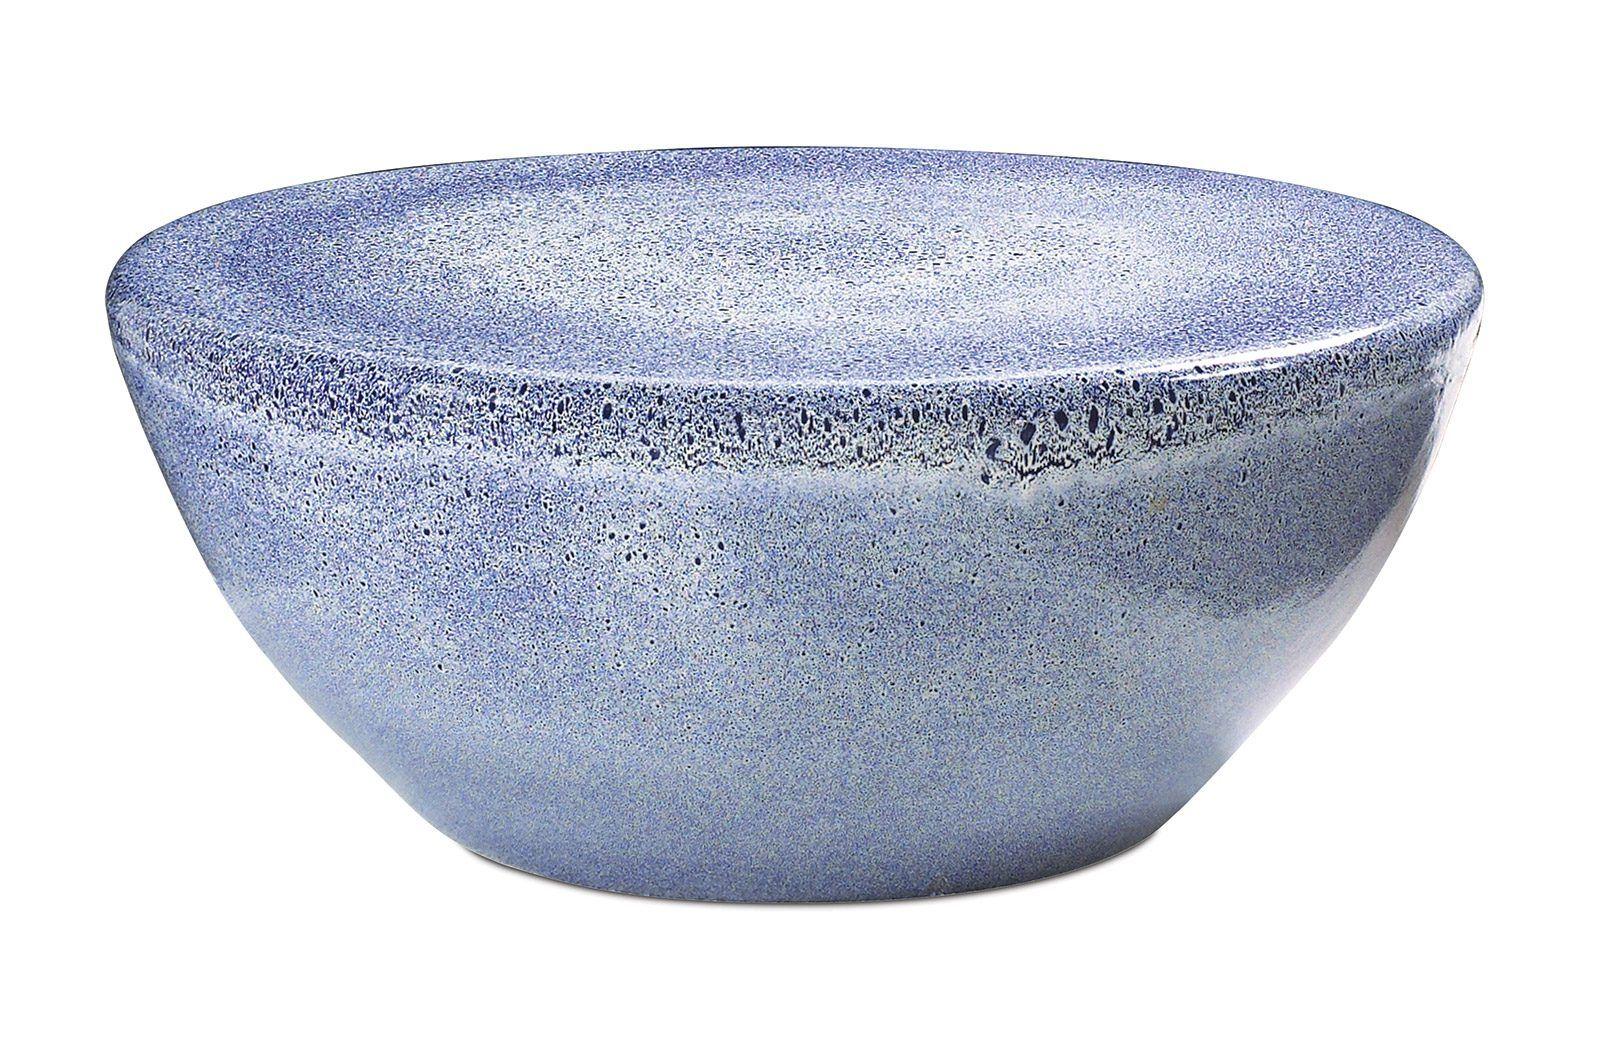 Ceramic Bowness Coffee Table - Seasonal Living